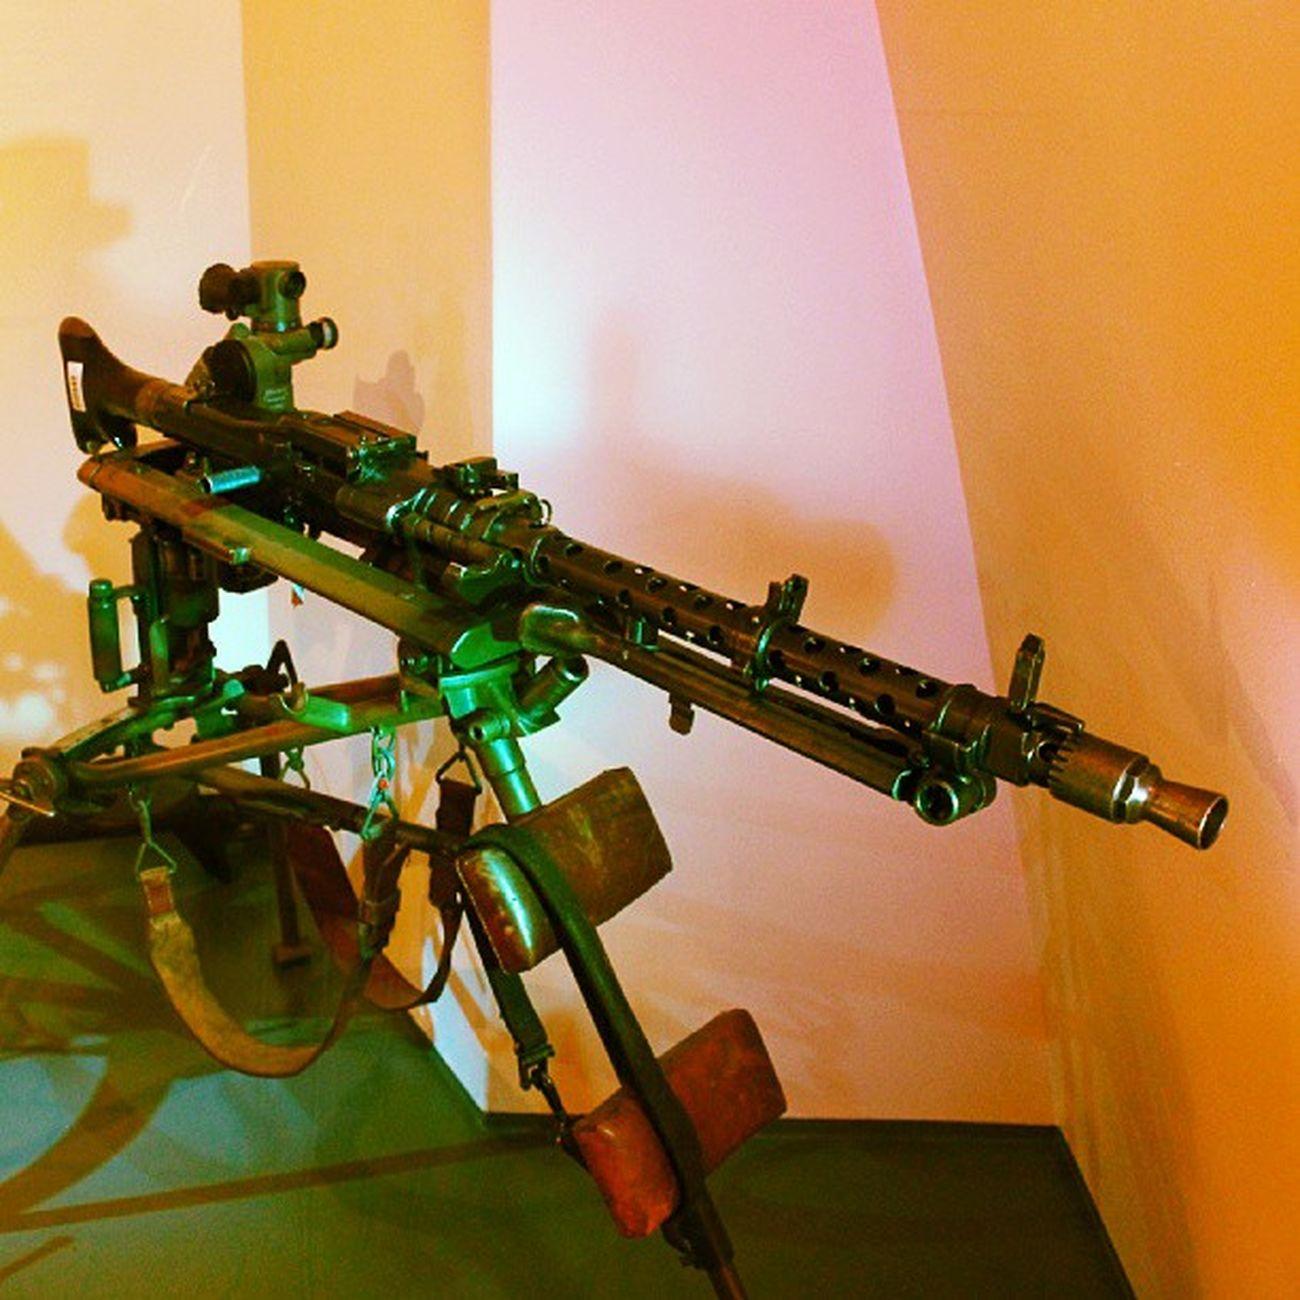 Oscarsborg Fortress Frogn Follo  akershus drøbak utstilling display h&k mg3 maskingevær hecklerundkoch ww2